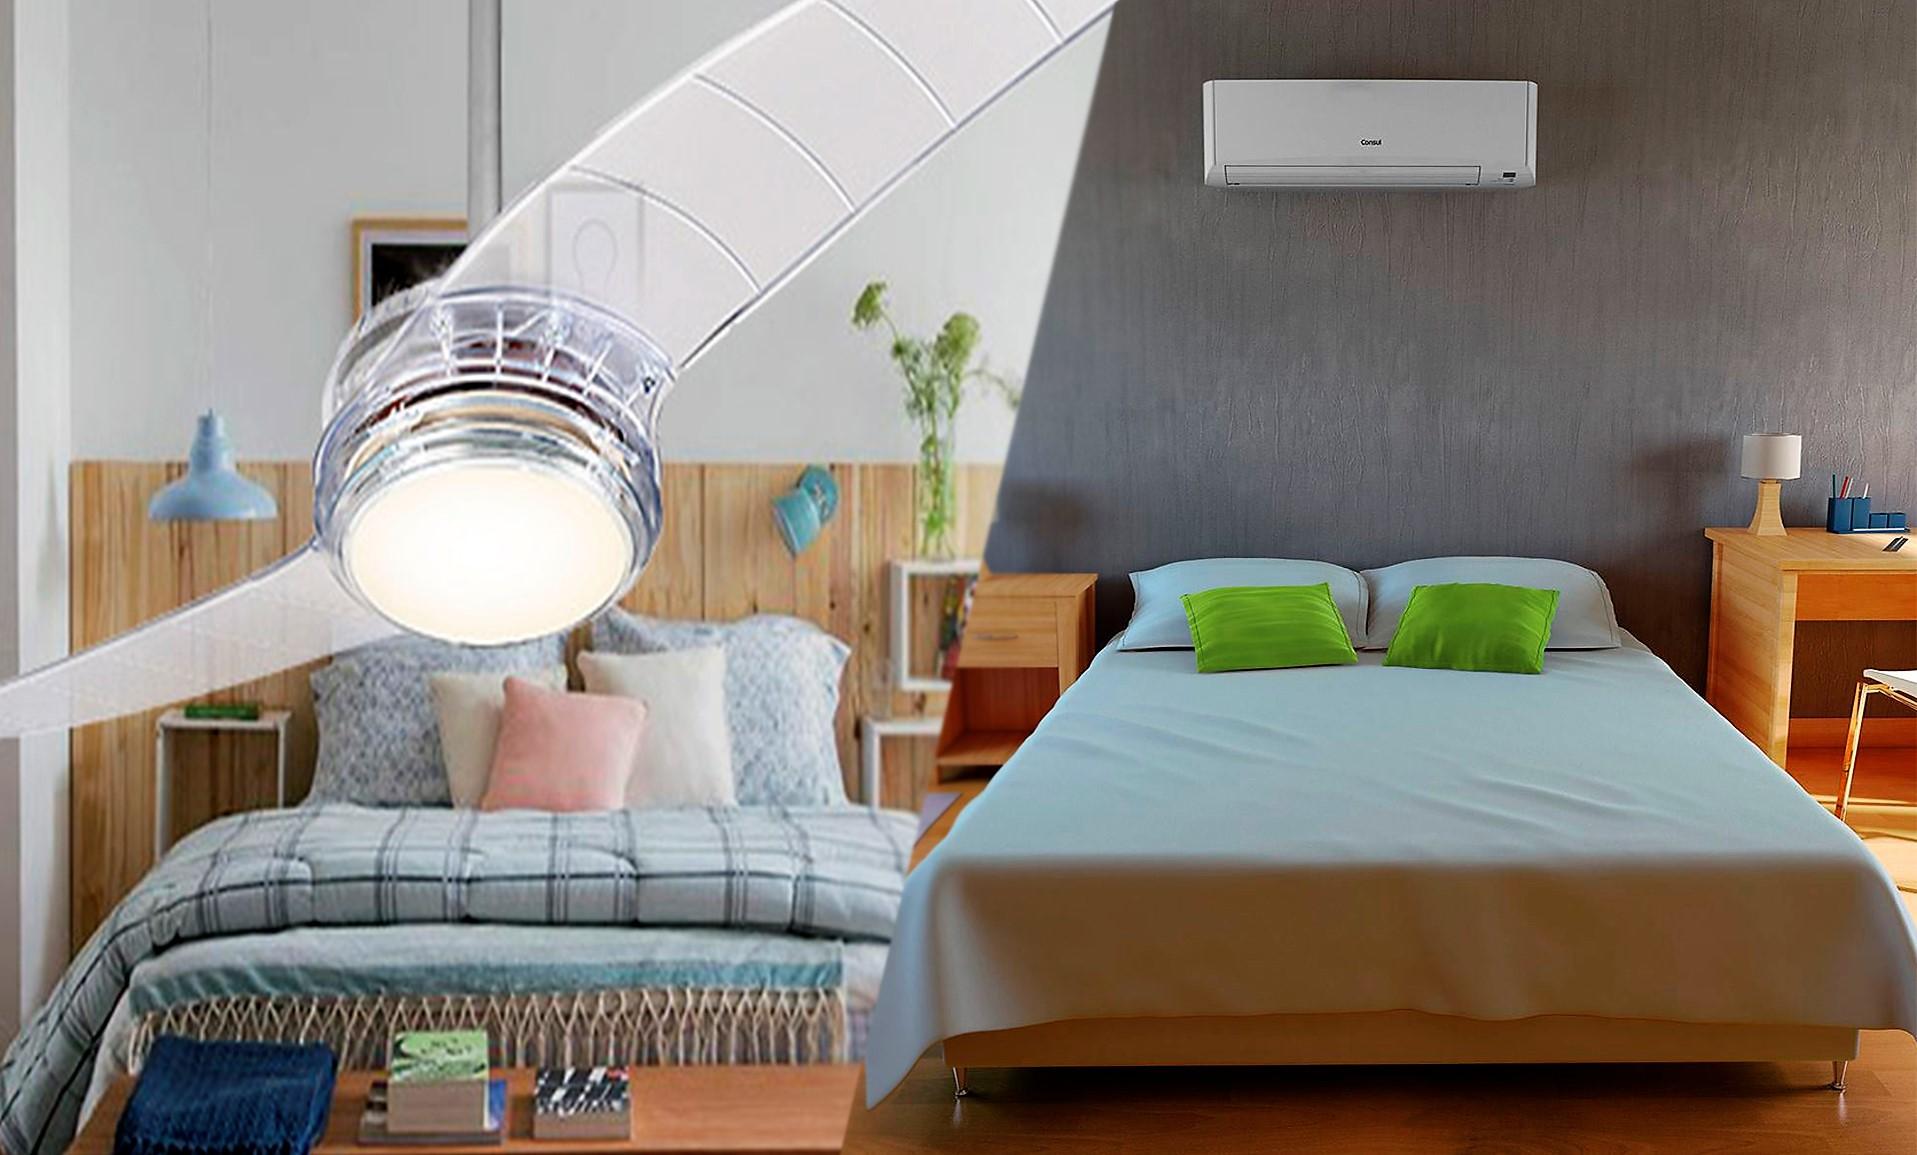 ventilador de teto Spirit - Blog Myspirit - capa blog - ventilador de teto ou ar-condicionado